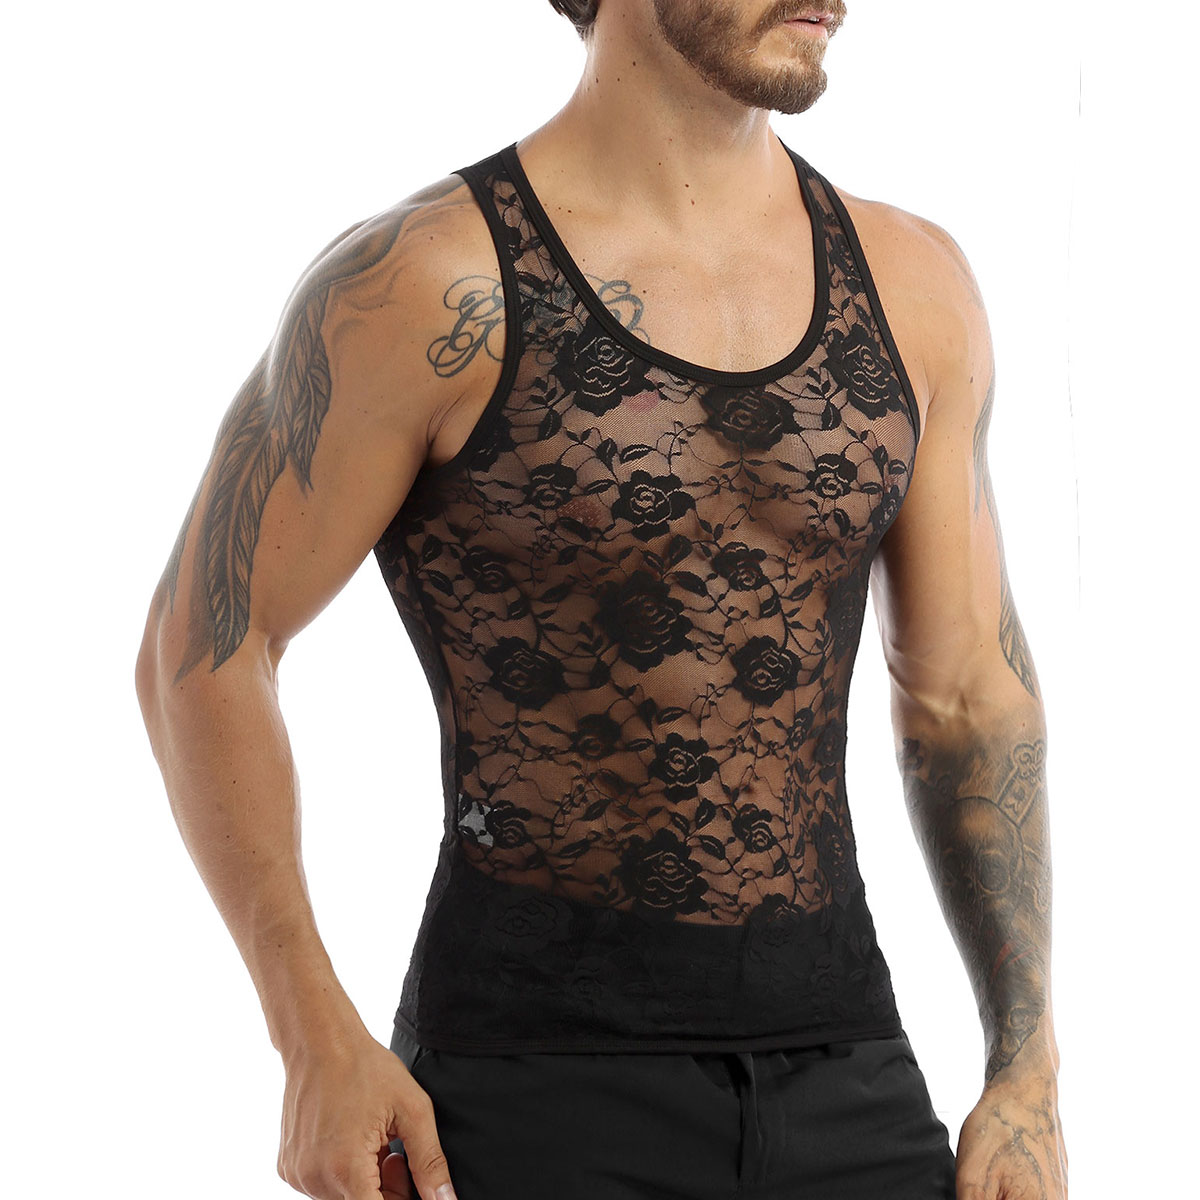 US Sissy Men Lingerie Stretchy Floral Lace Vest Undershirt Tank Tops Underwear